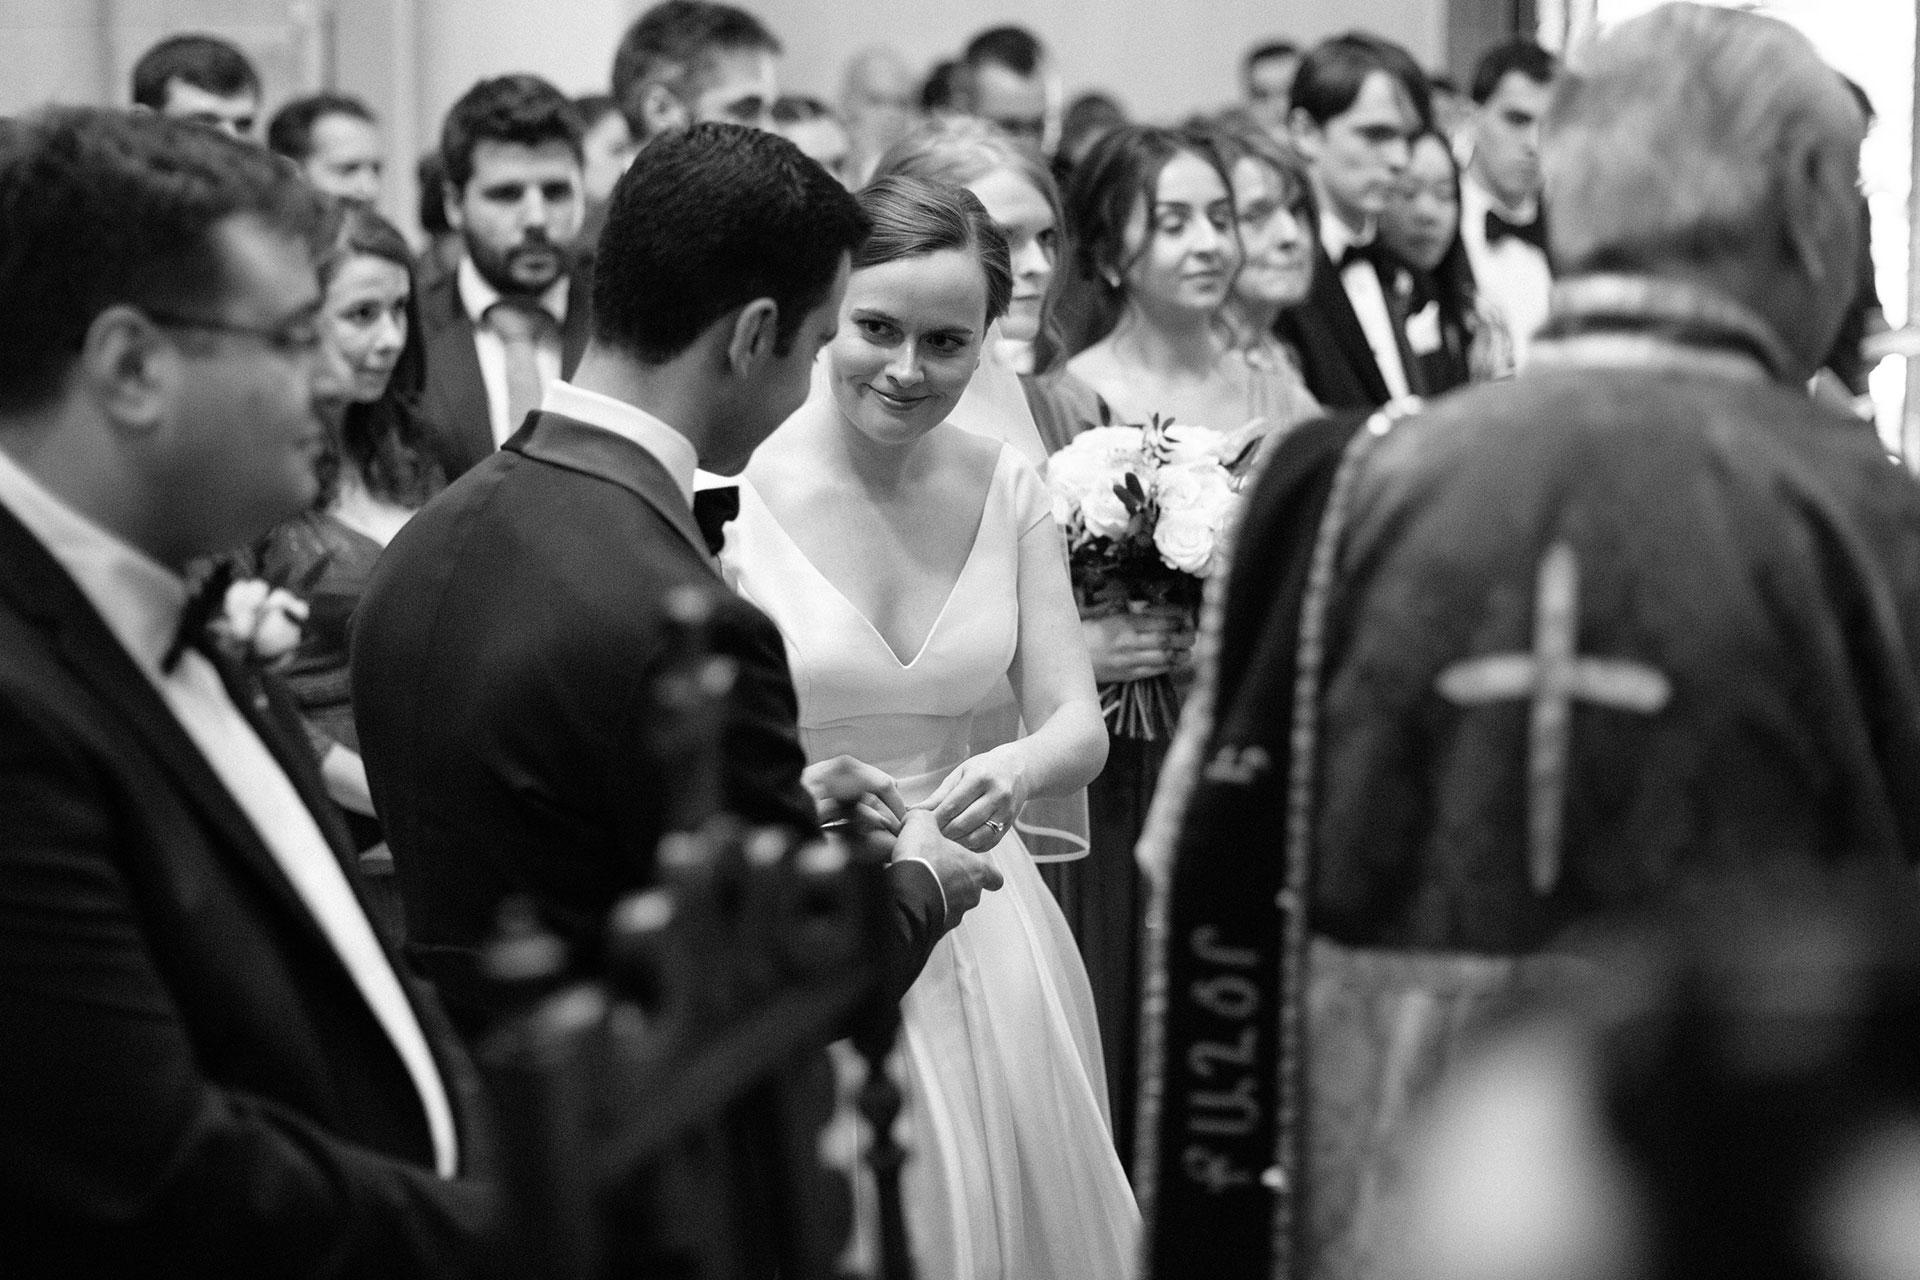 Syon-Park-Wedding-Photographer--_-Michael-Newington-Gray-127.jpg